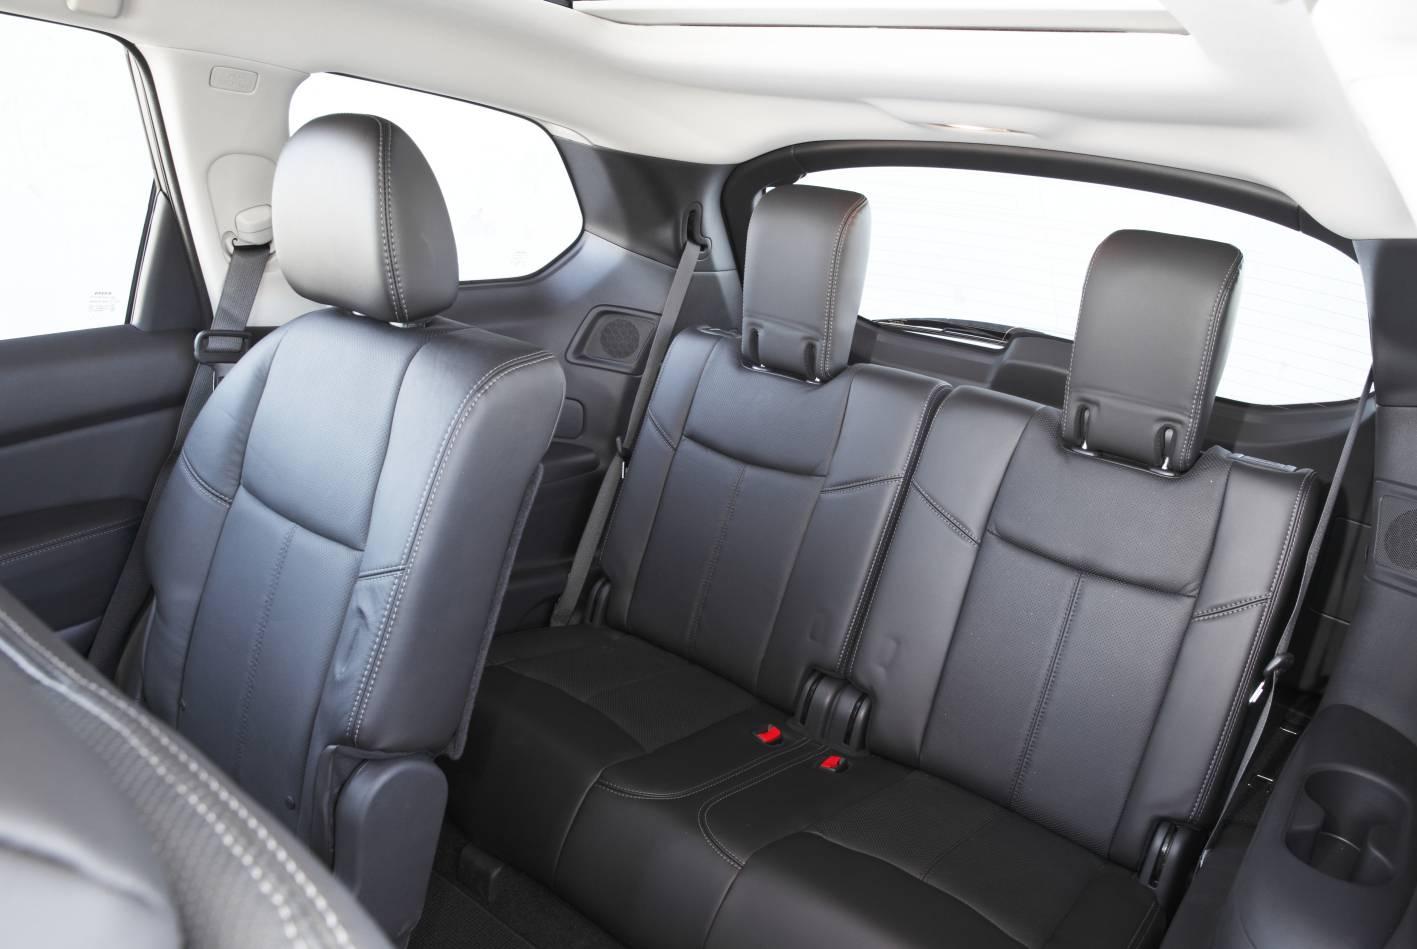 2014 Nissan Pathfinder third row seats - ForceGT.com